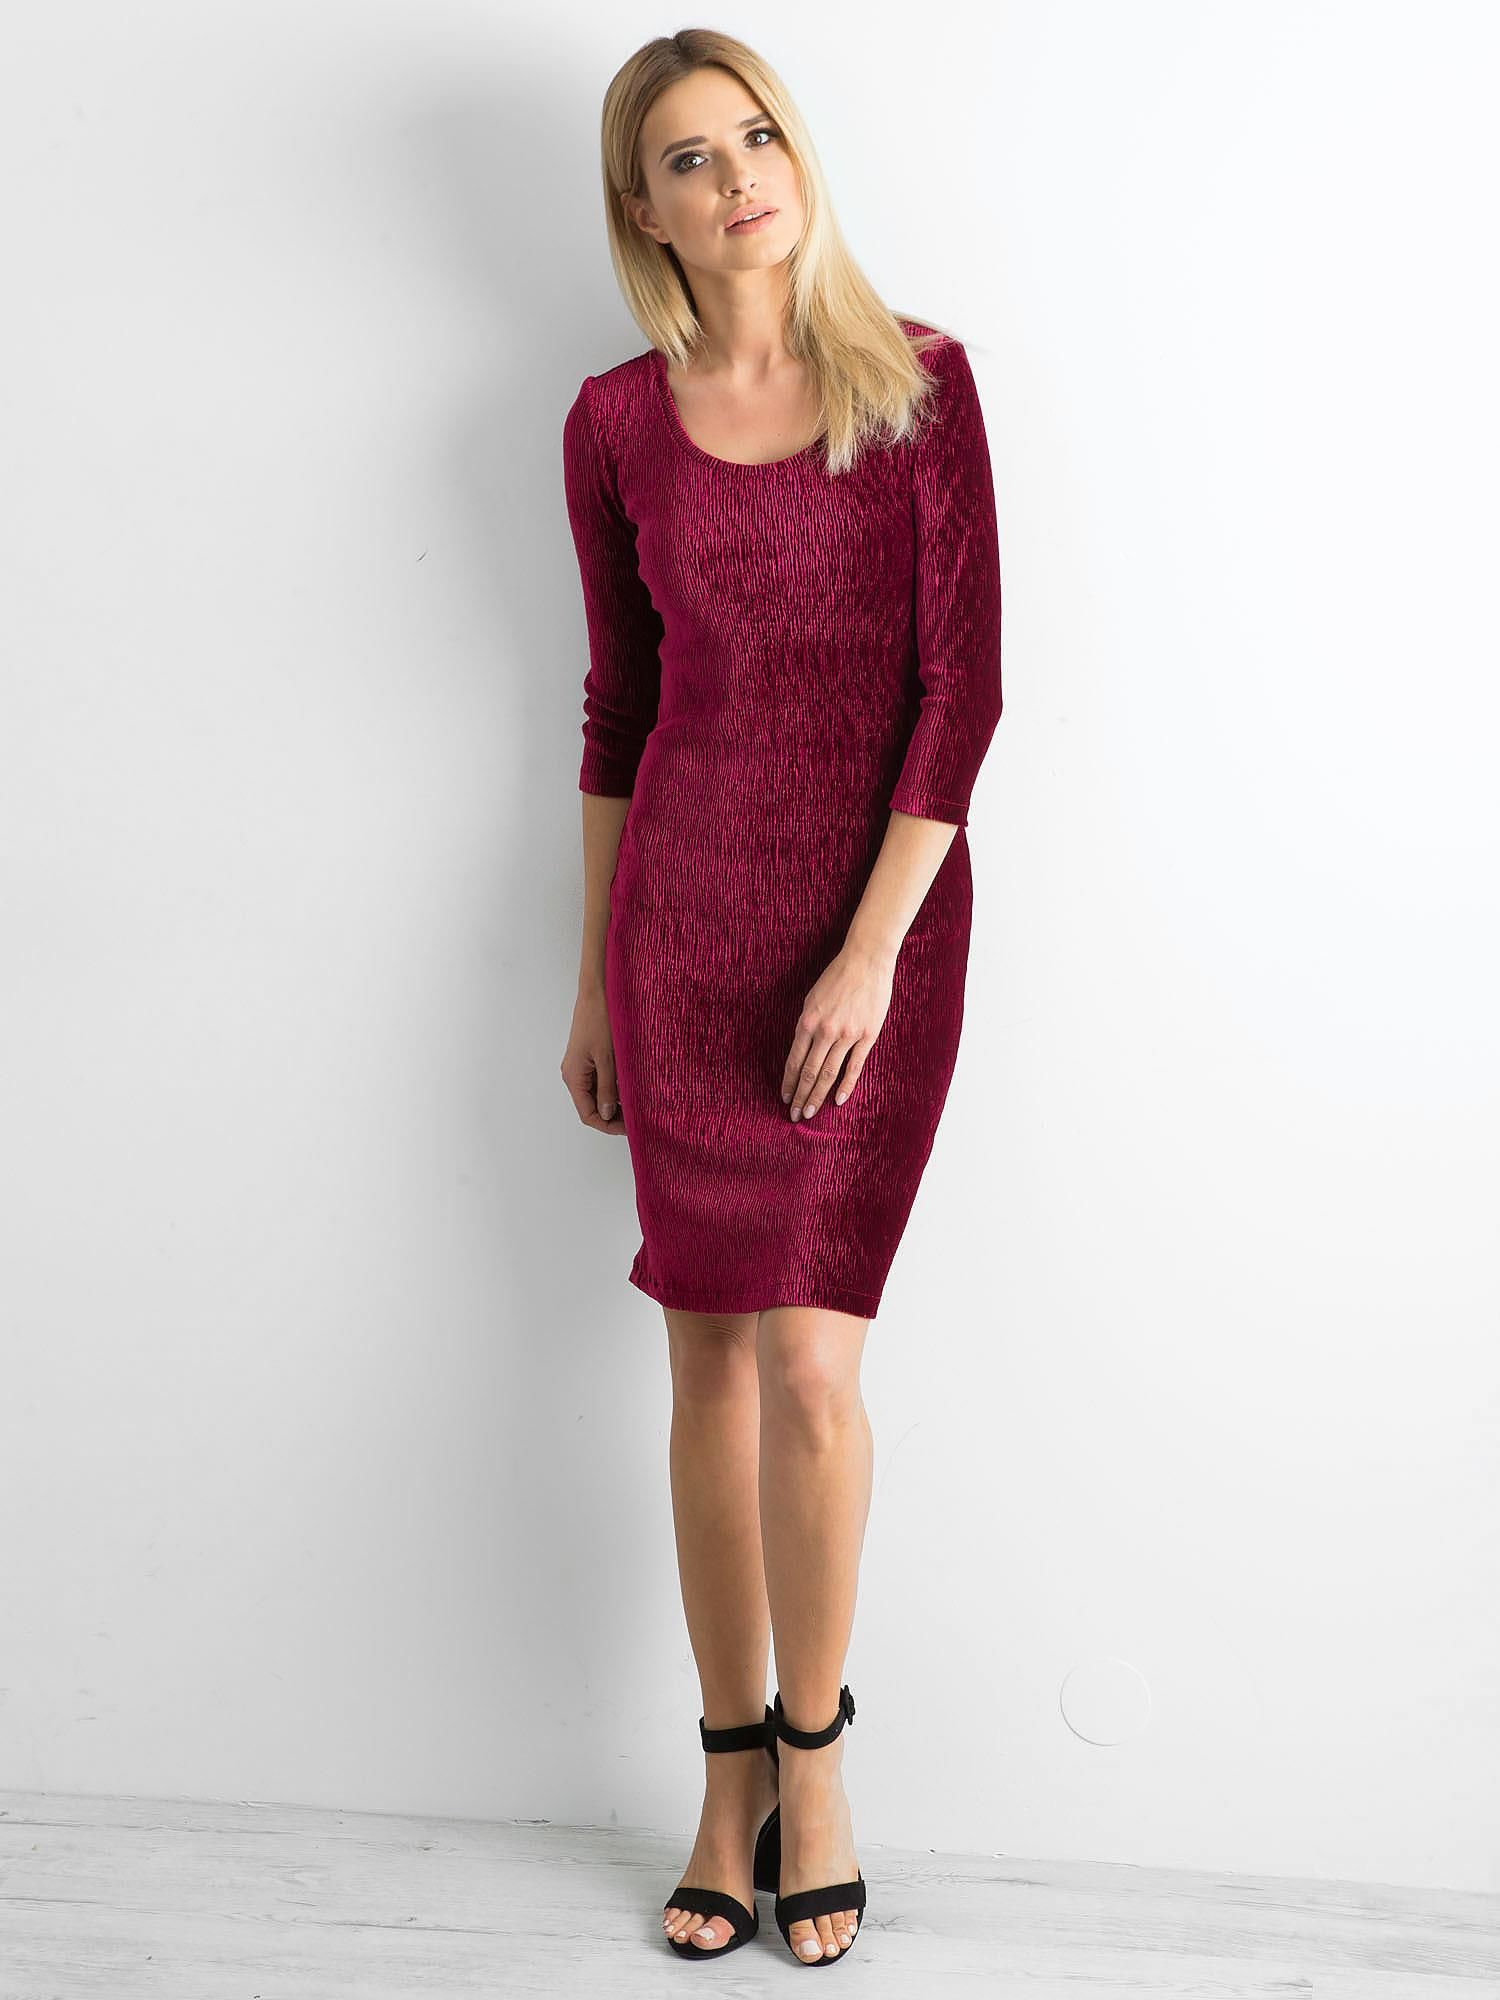 27966d58fc1904 Bordowa dopasowana welurowa sukienka - Sukienka dopasowana - sklep eButik.pl